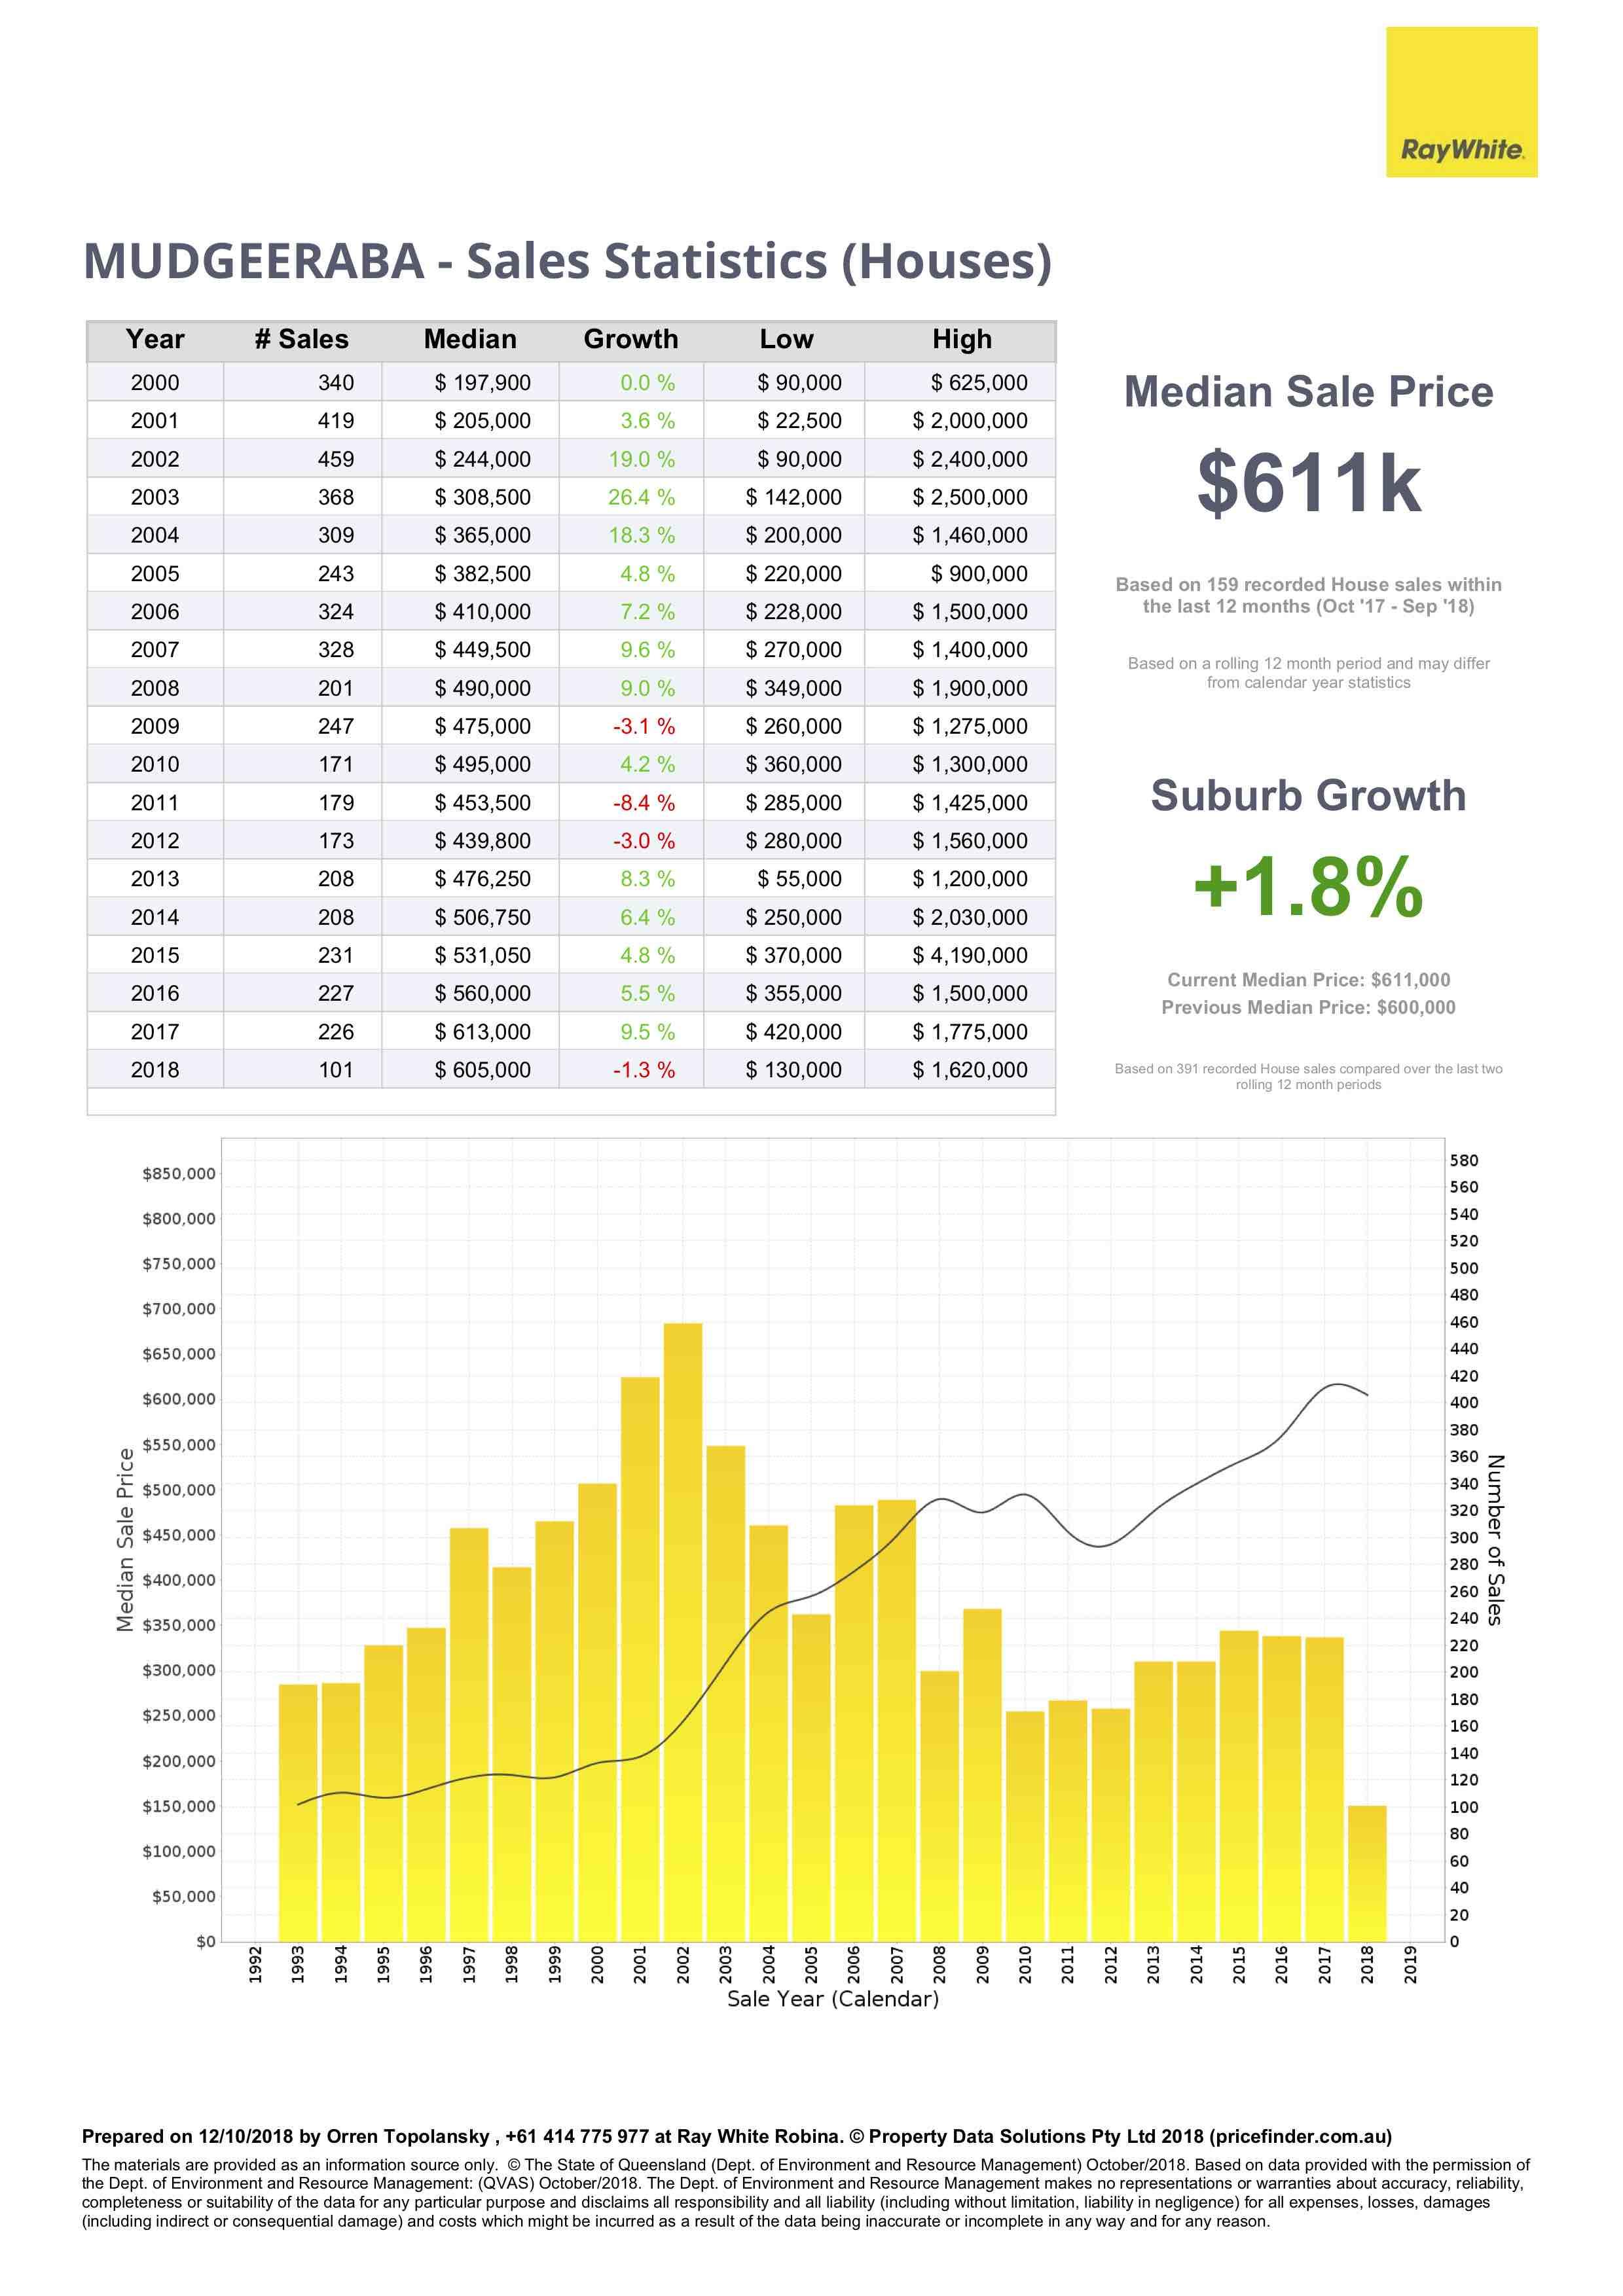 House price data for Mudgeeraba, Gold Coast